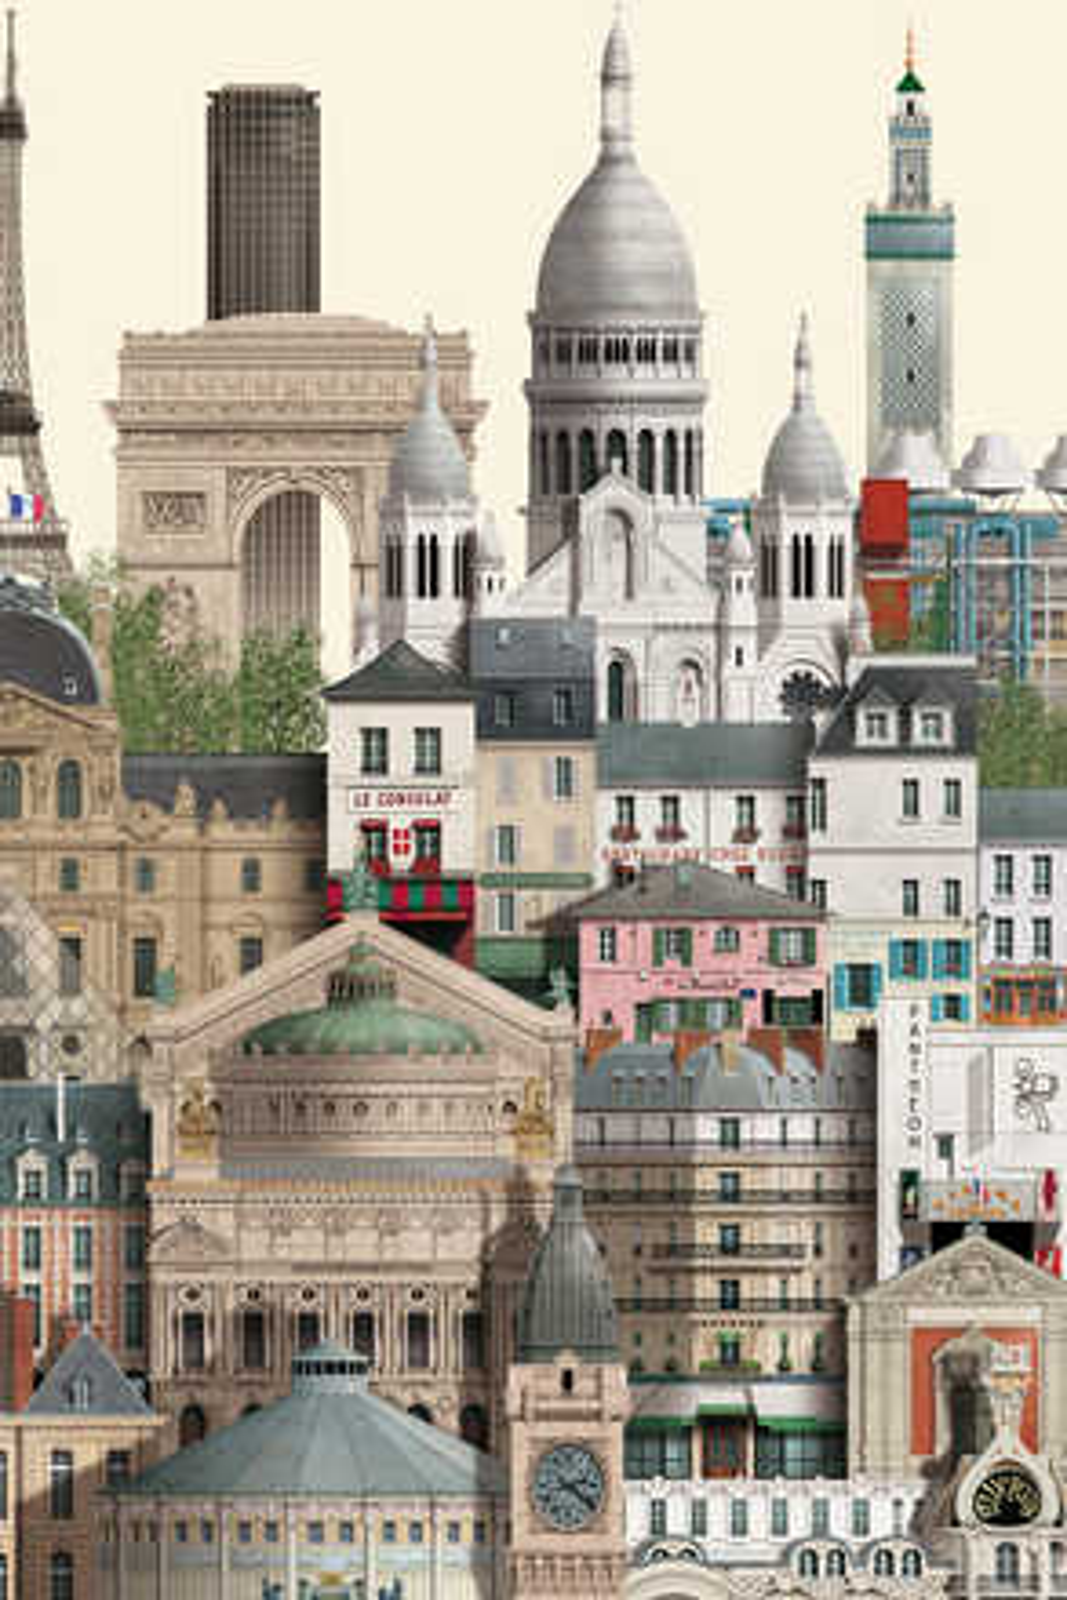 Paris II - Martin Schwartz